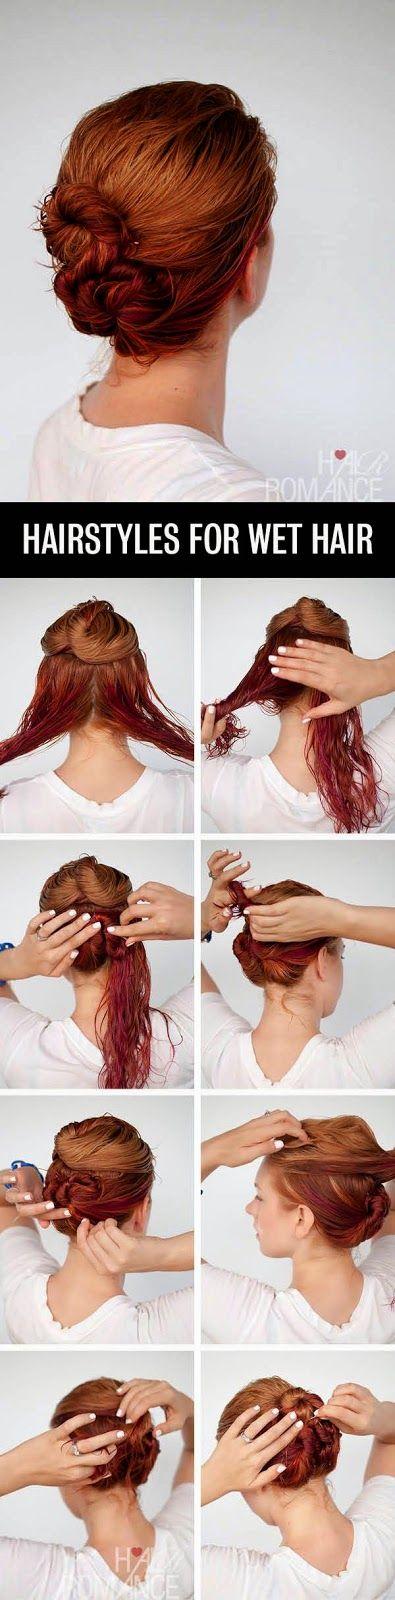 Hair Style For Wet Hair!